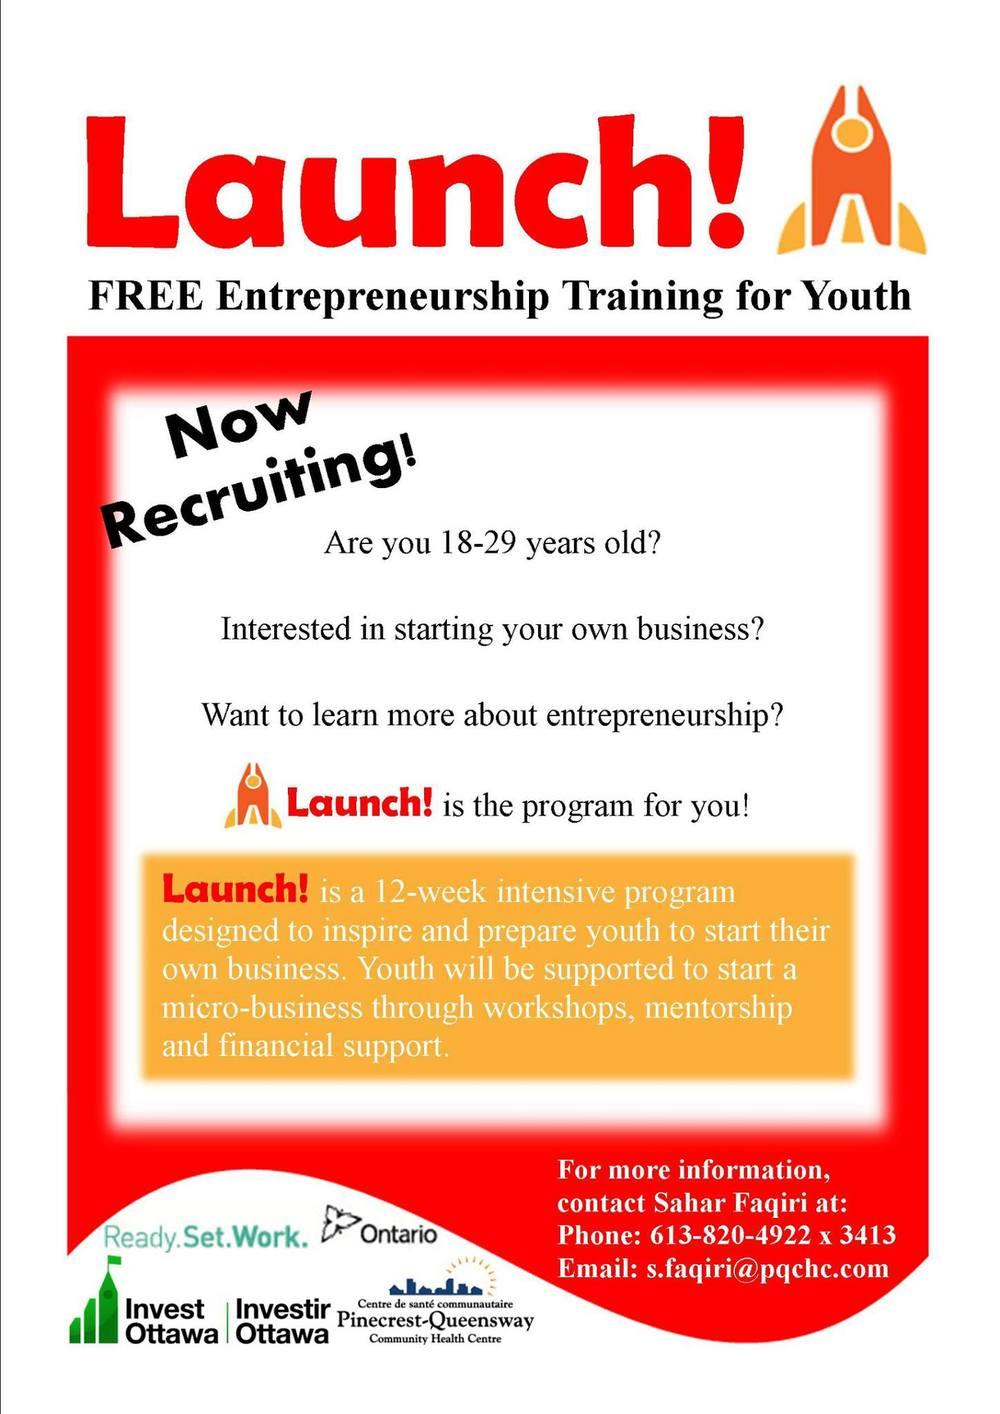 launch free business program for youth ottawa.jpg